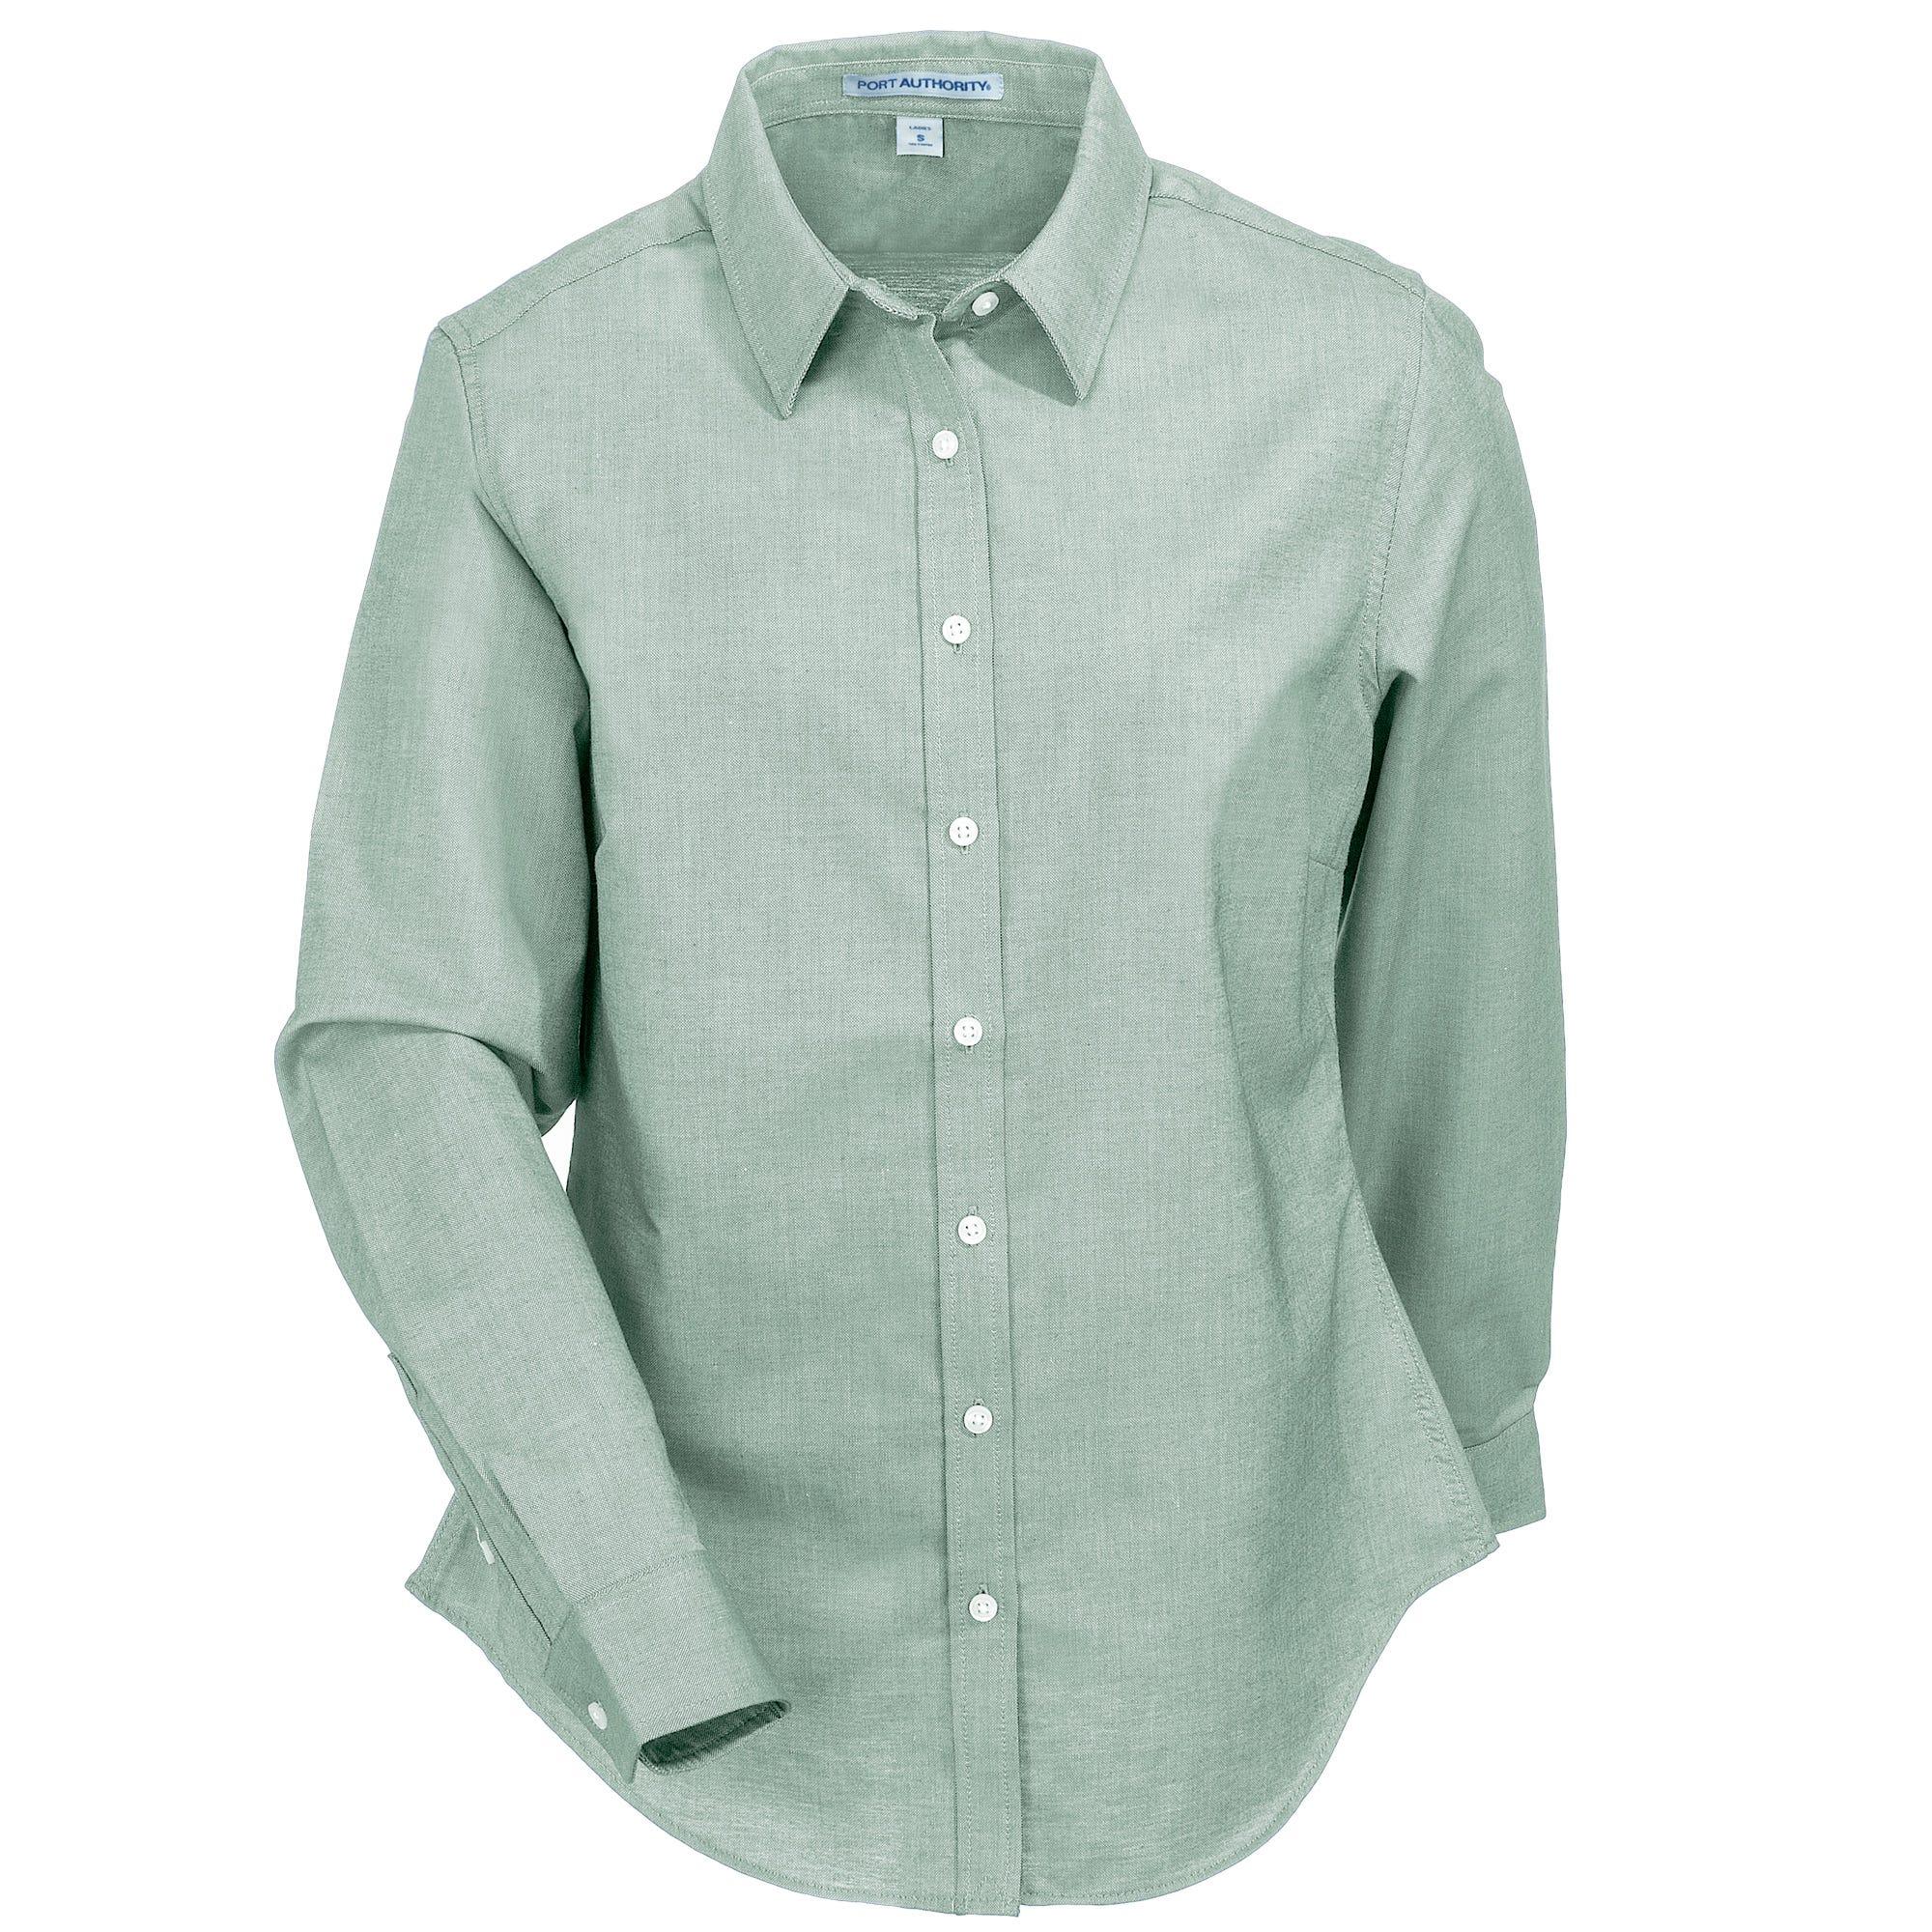 Port Authority Women's L658 GRN SuperPro Green Oxford Shirt